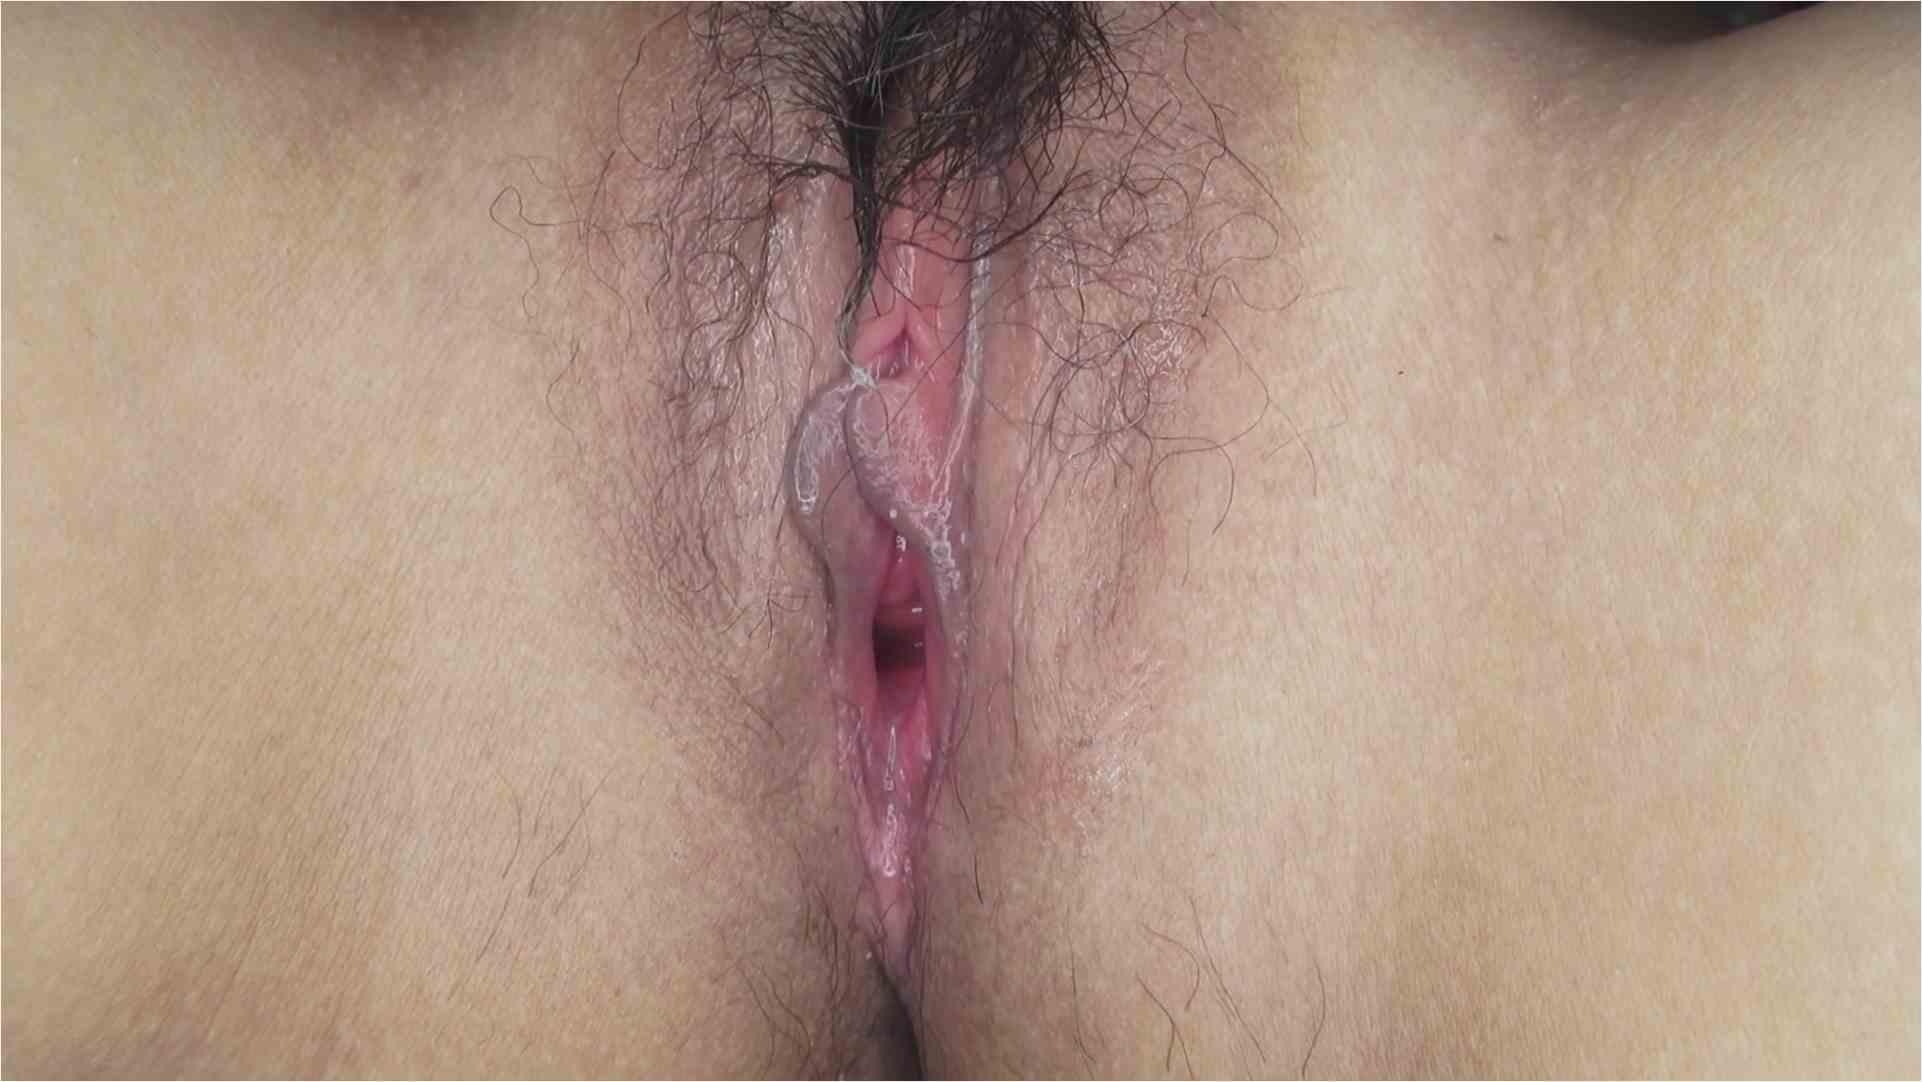 Heyzo-2005-裸エプロンで熟女をハメてヤりました